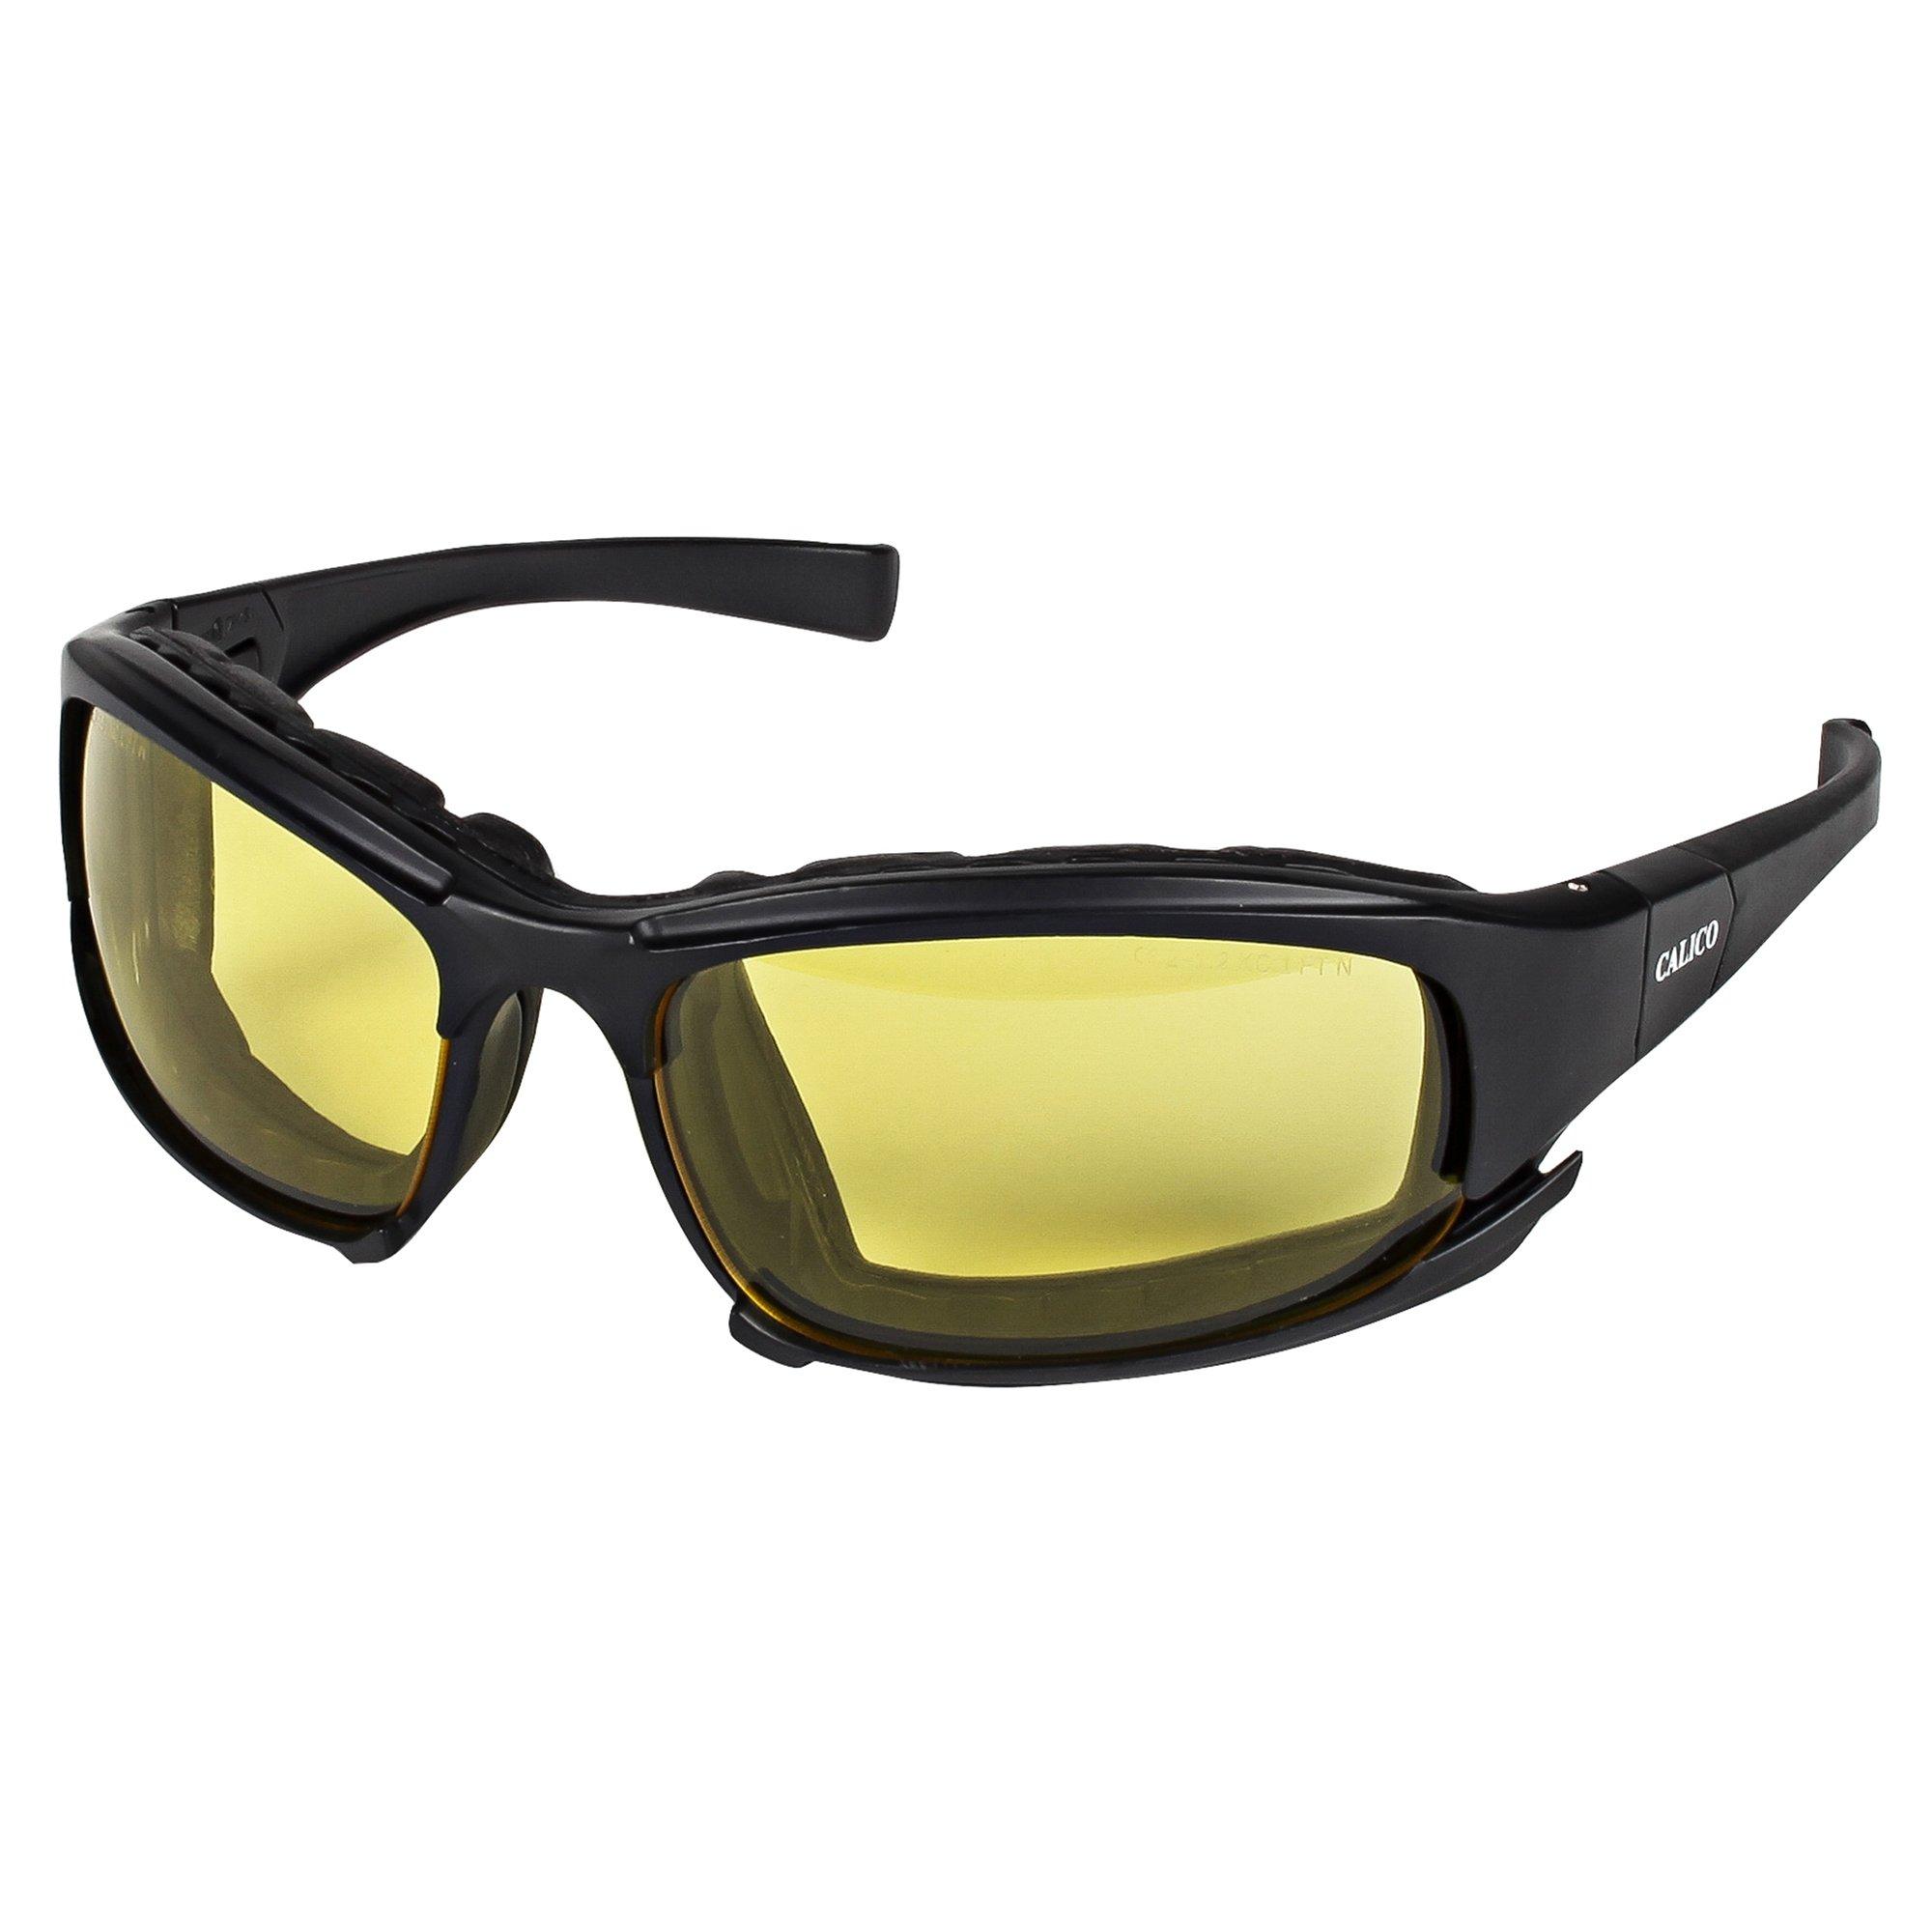 Jackson Safety Calico Safety Eyewear V50 (25674), Amber Anti-Fog Lens, Interchangeable Temple / Head Strap